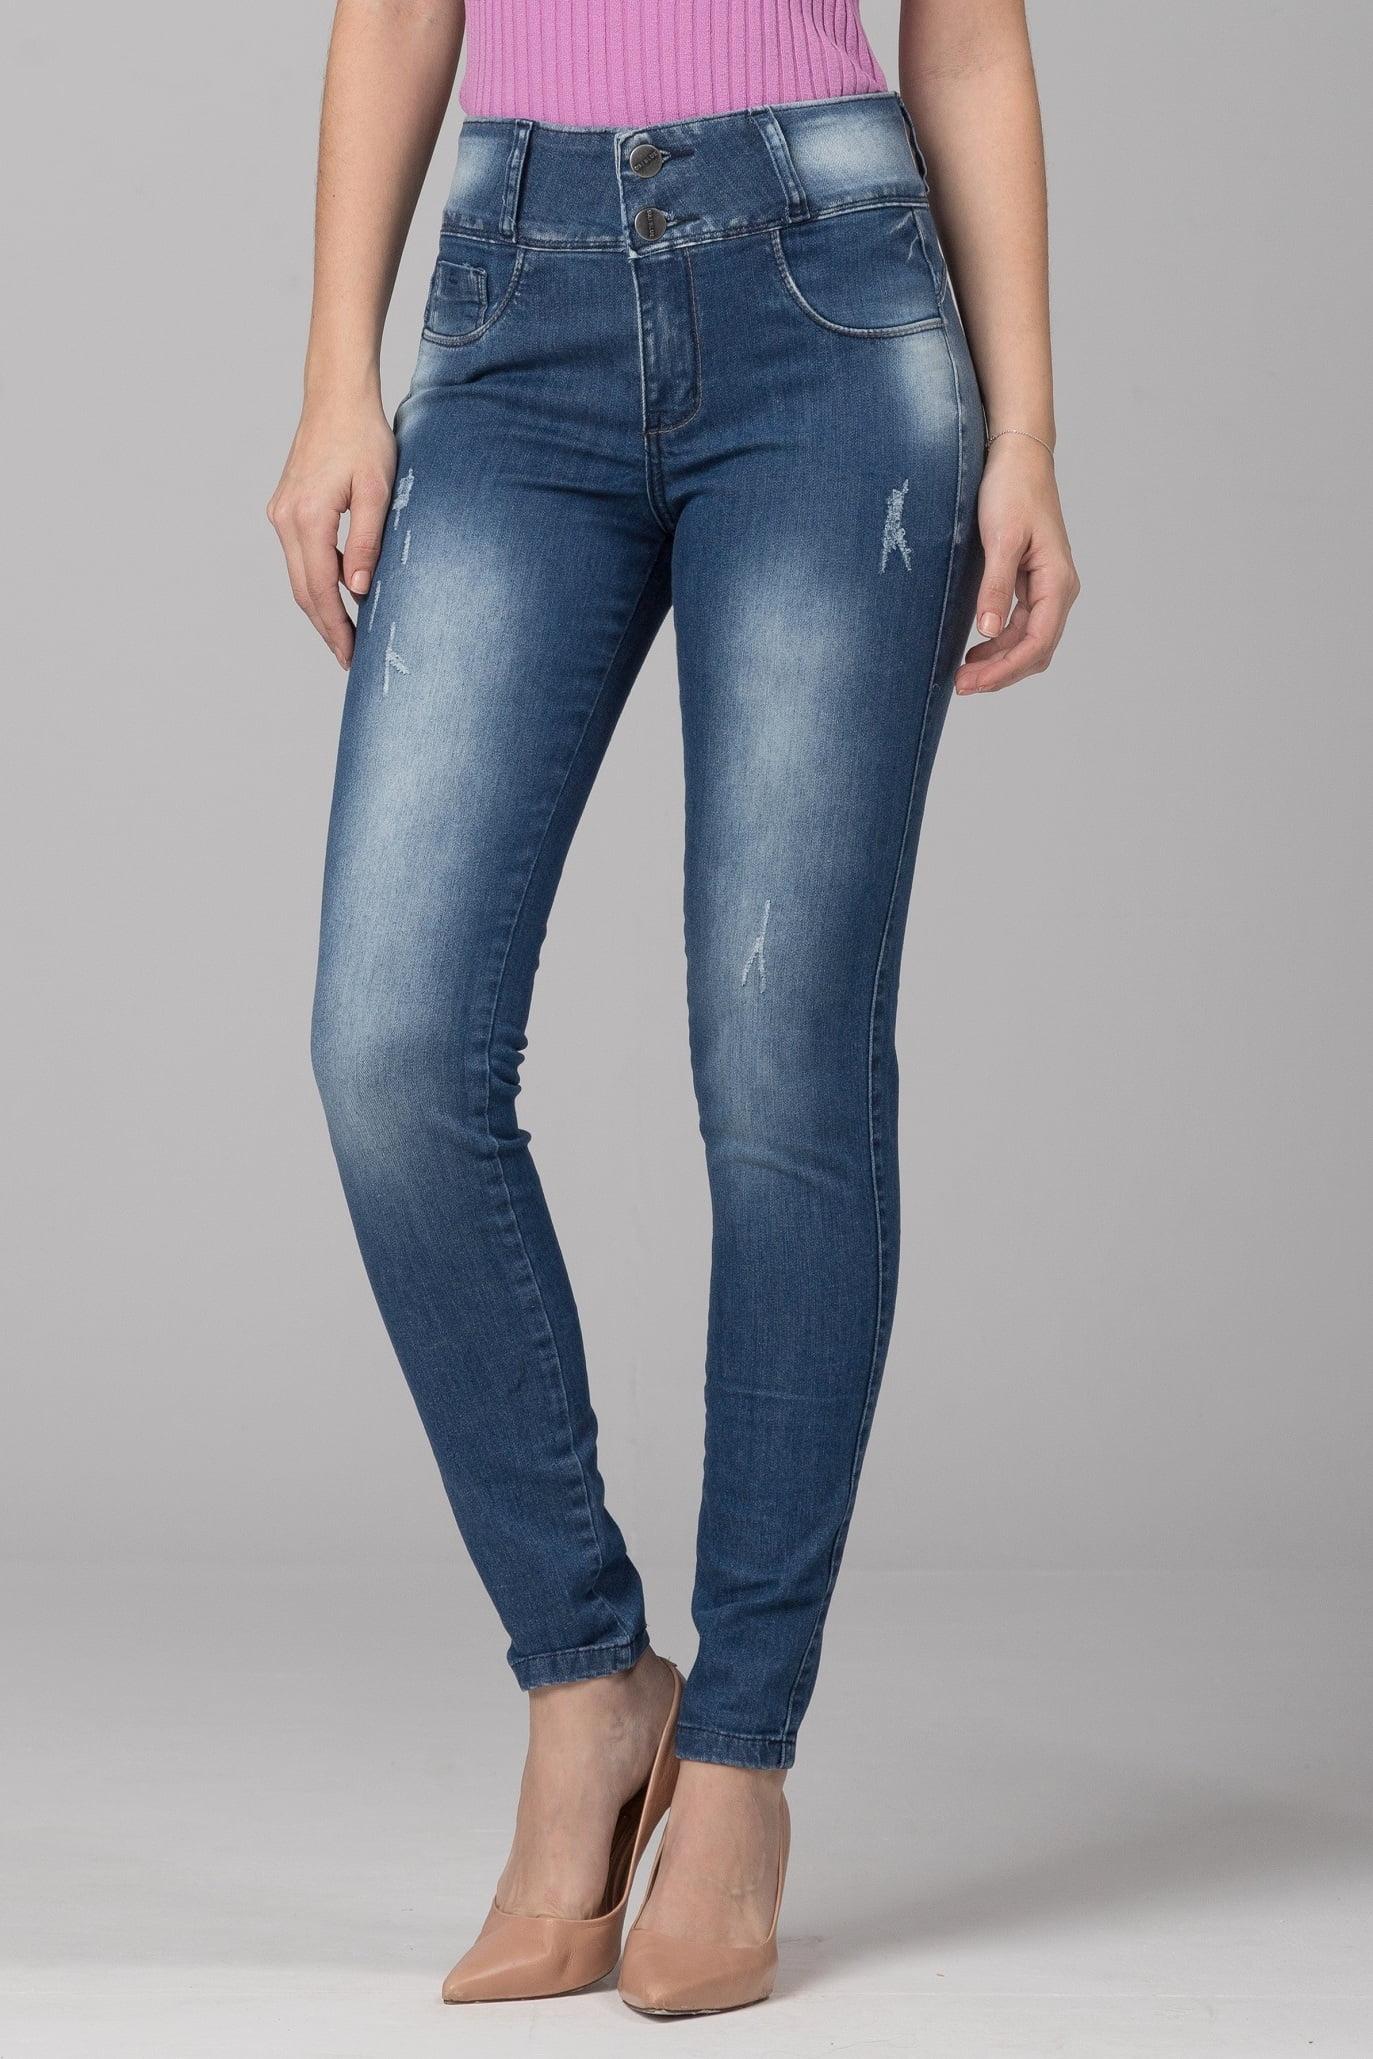 Calça Jeans Skinny Levanta Bumbum F2021063